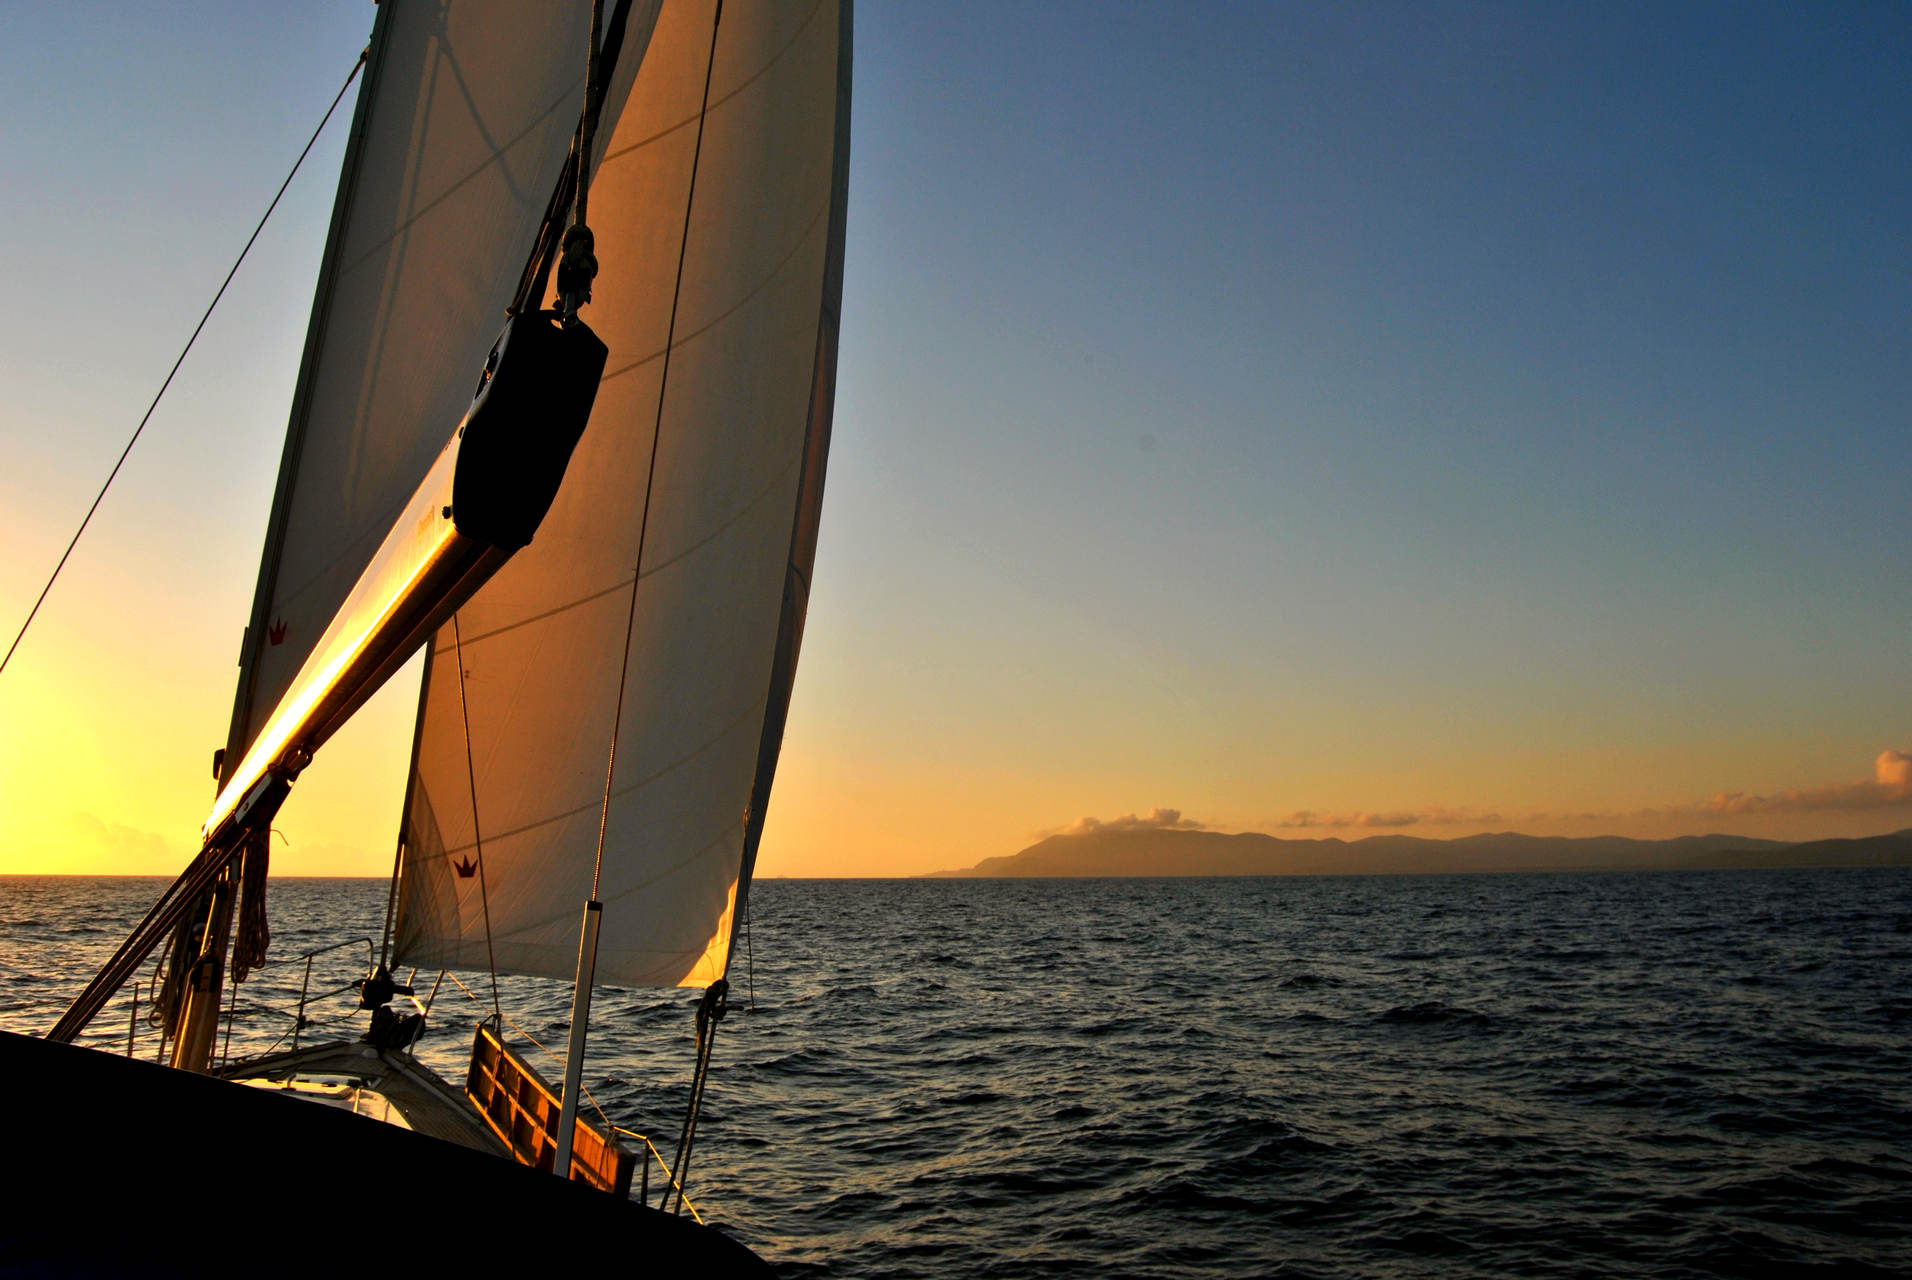 l'isola d'Elba al tramonto